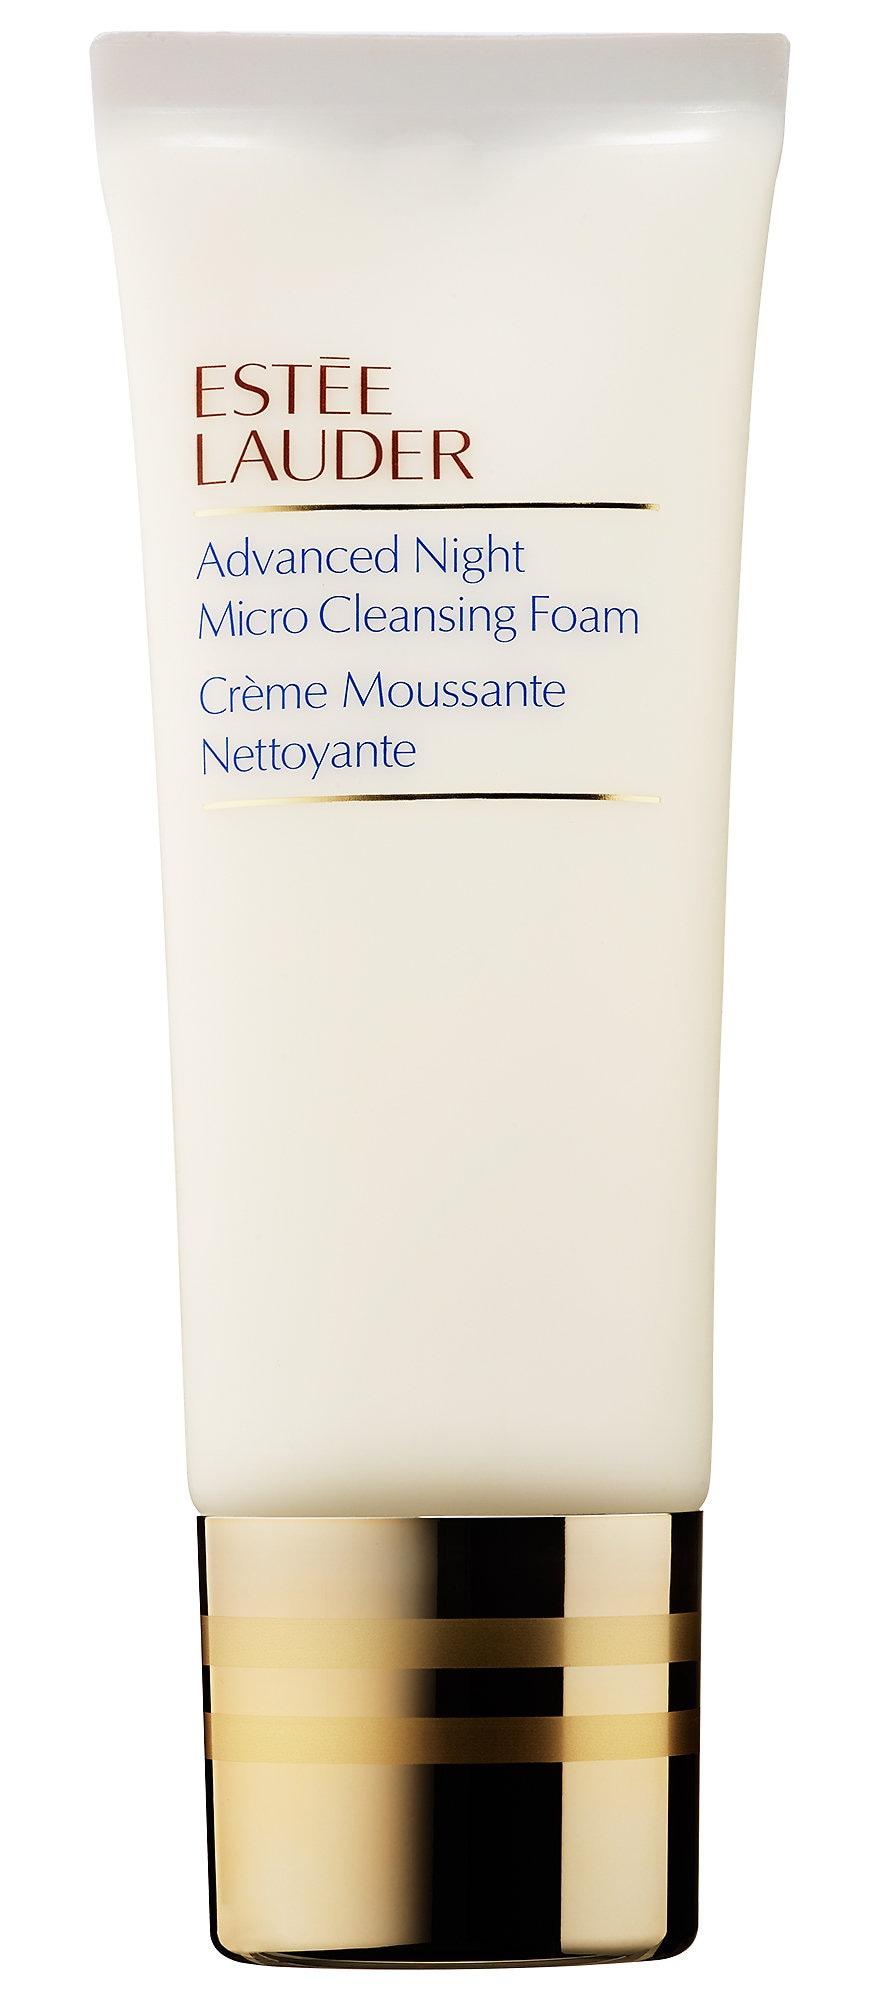 Estée Lauder Advanced Night Micro Cleansing Foam